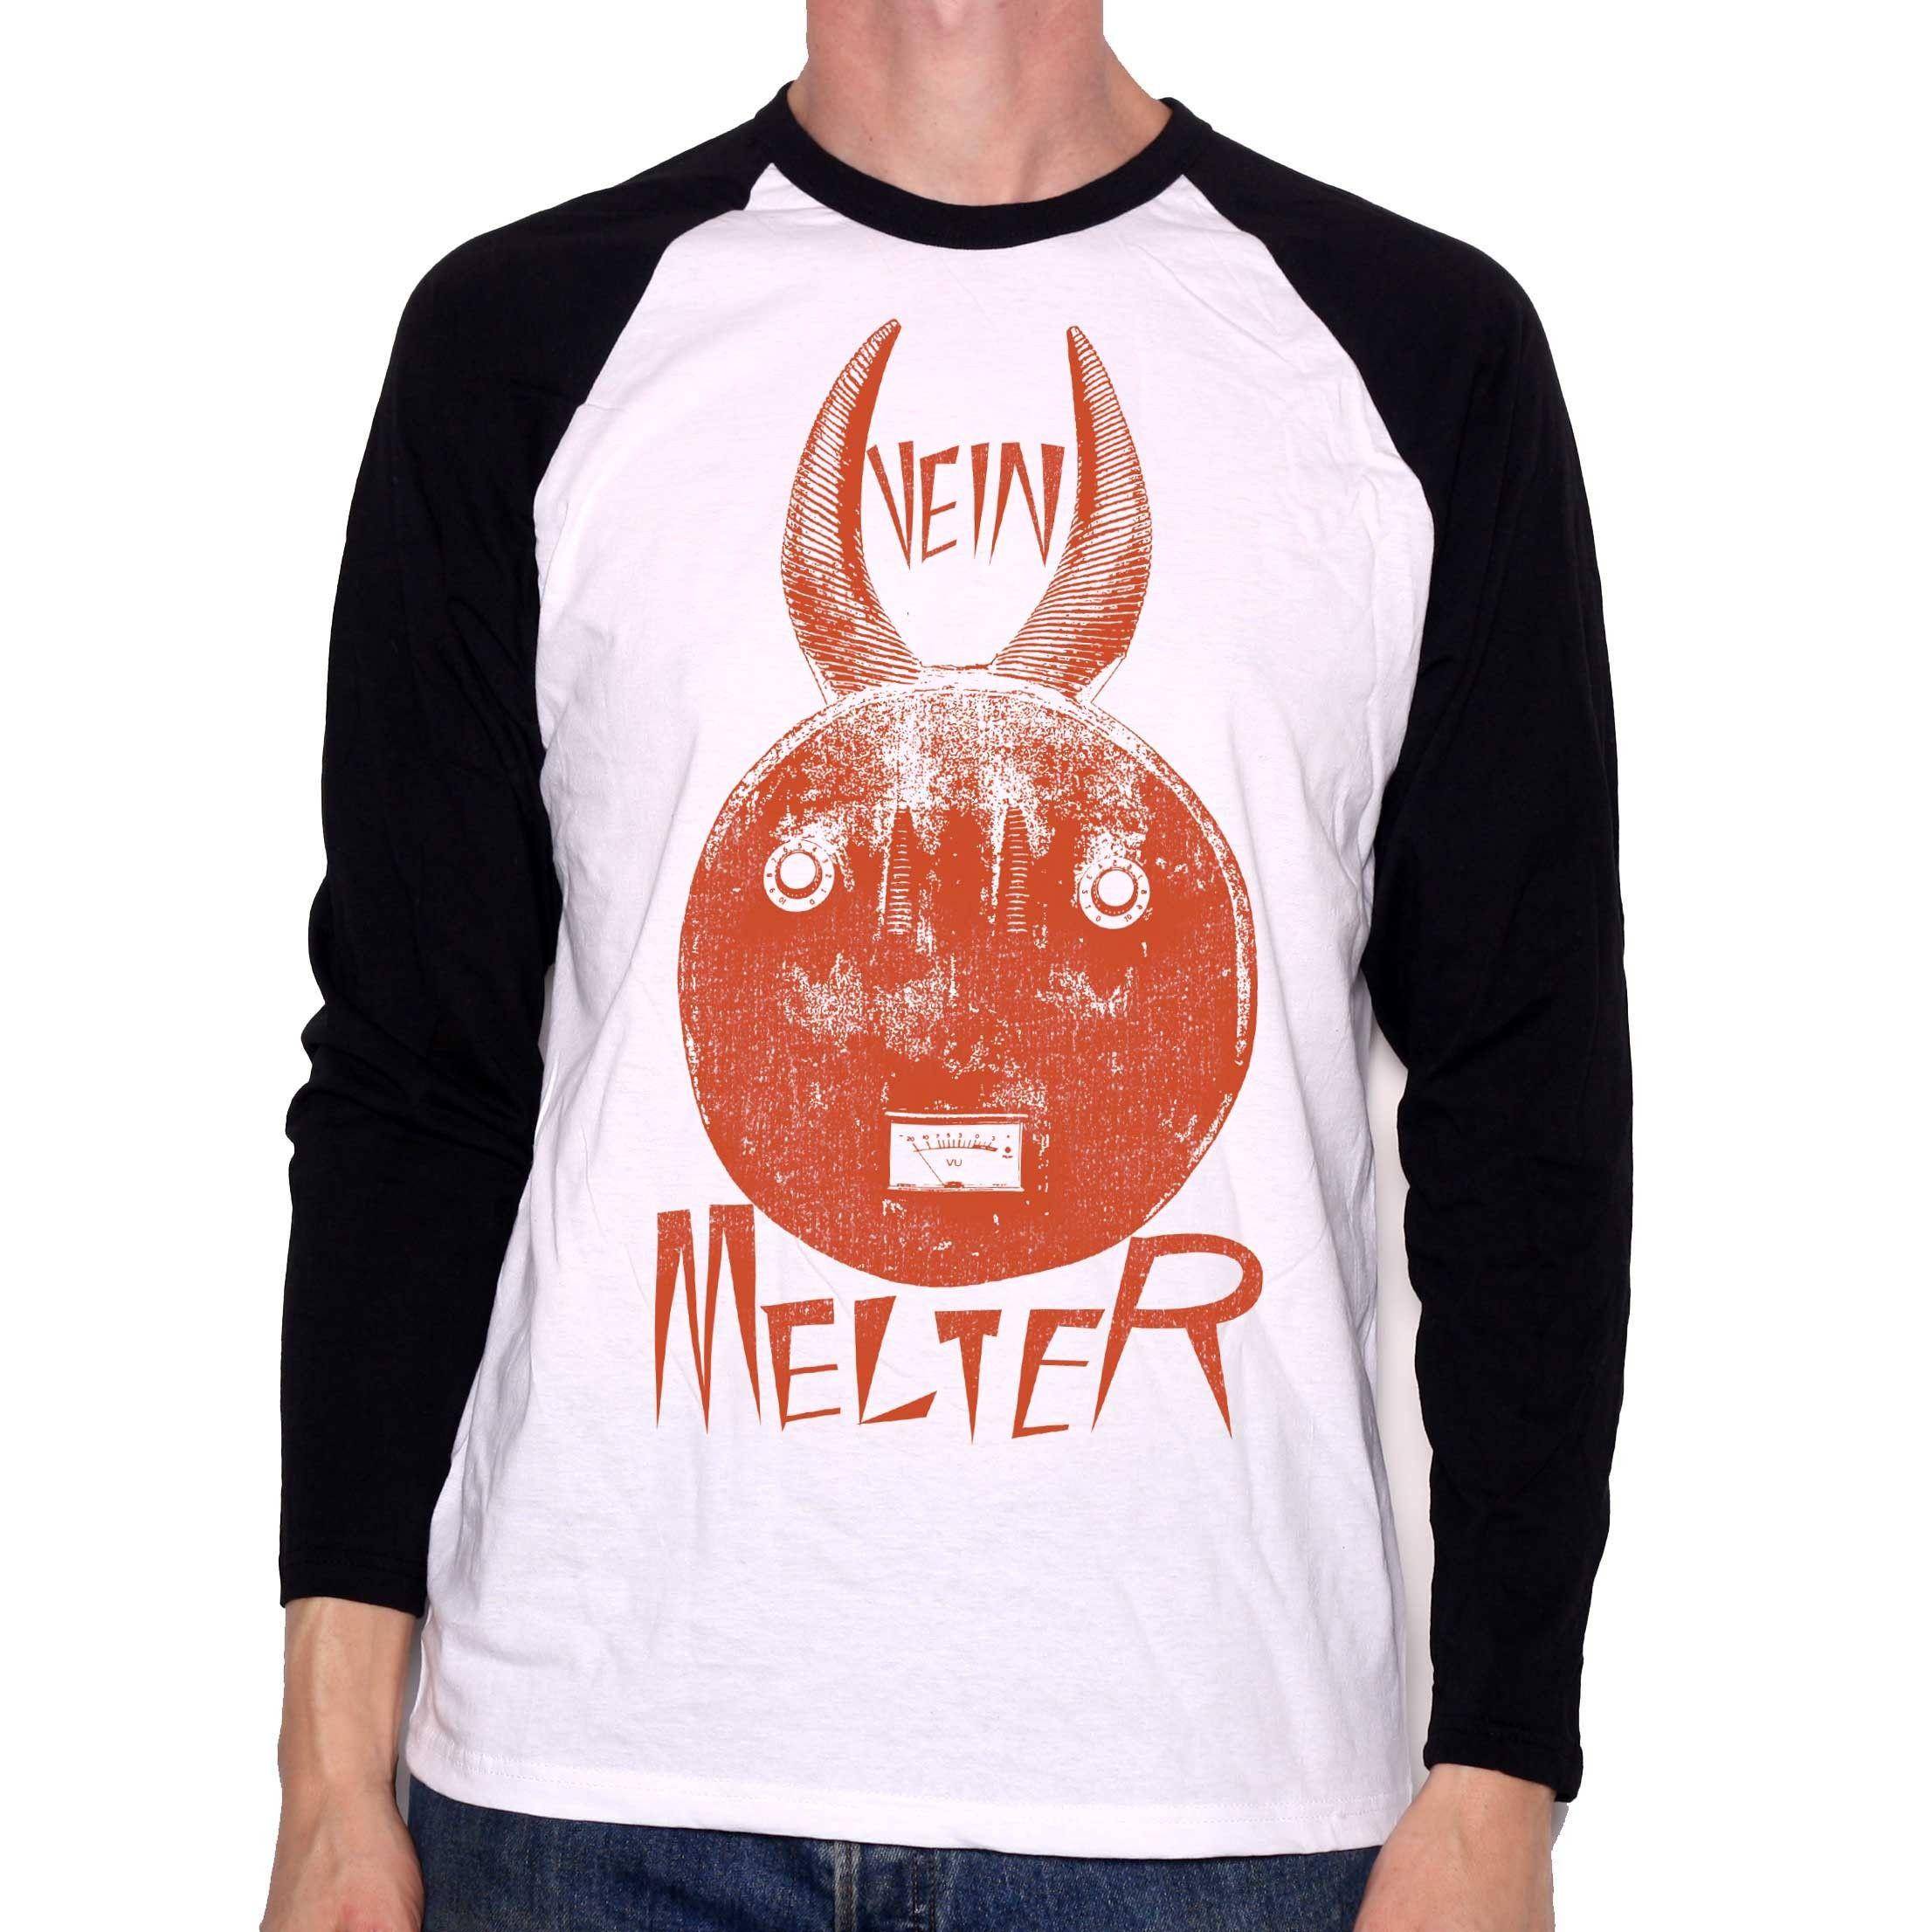 Vein Melter T shirt inspired by Herbie Hancock ...